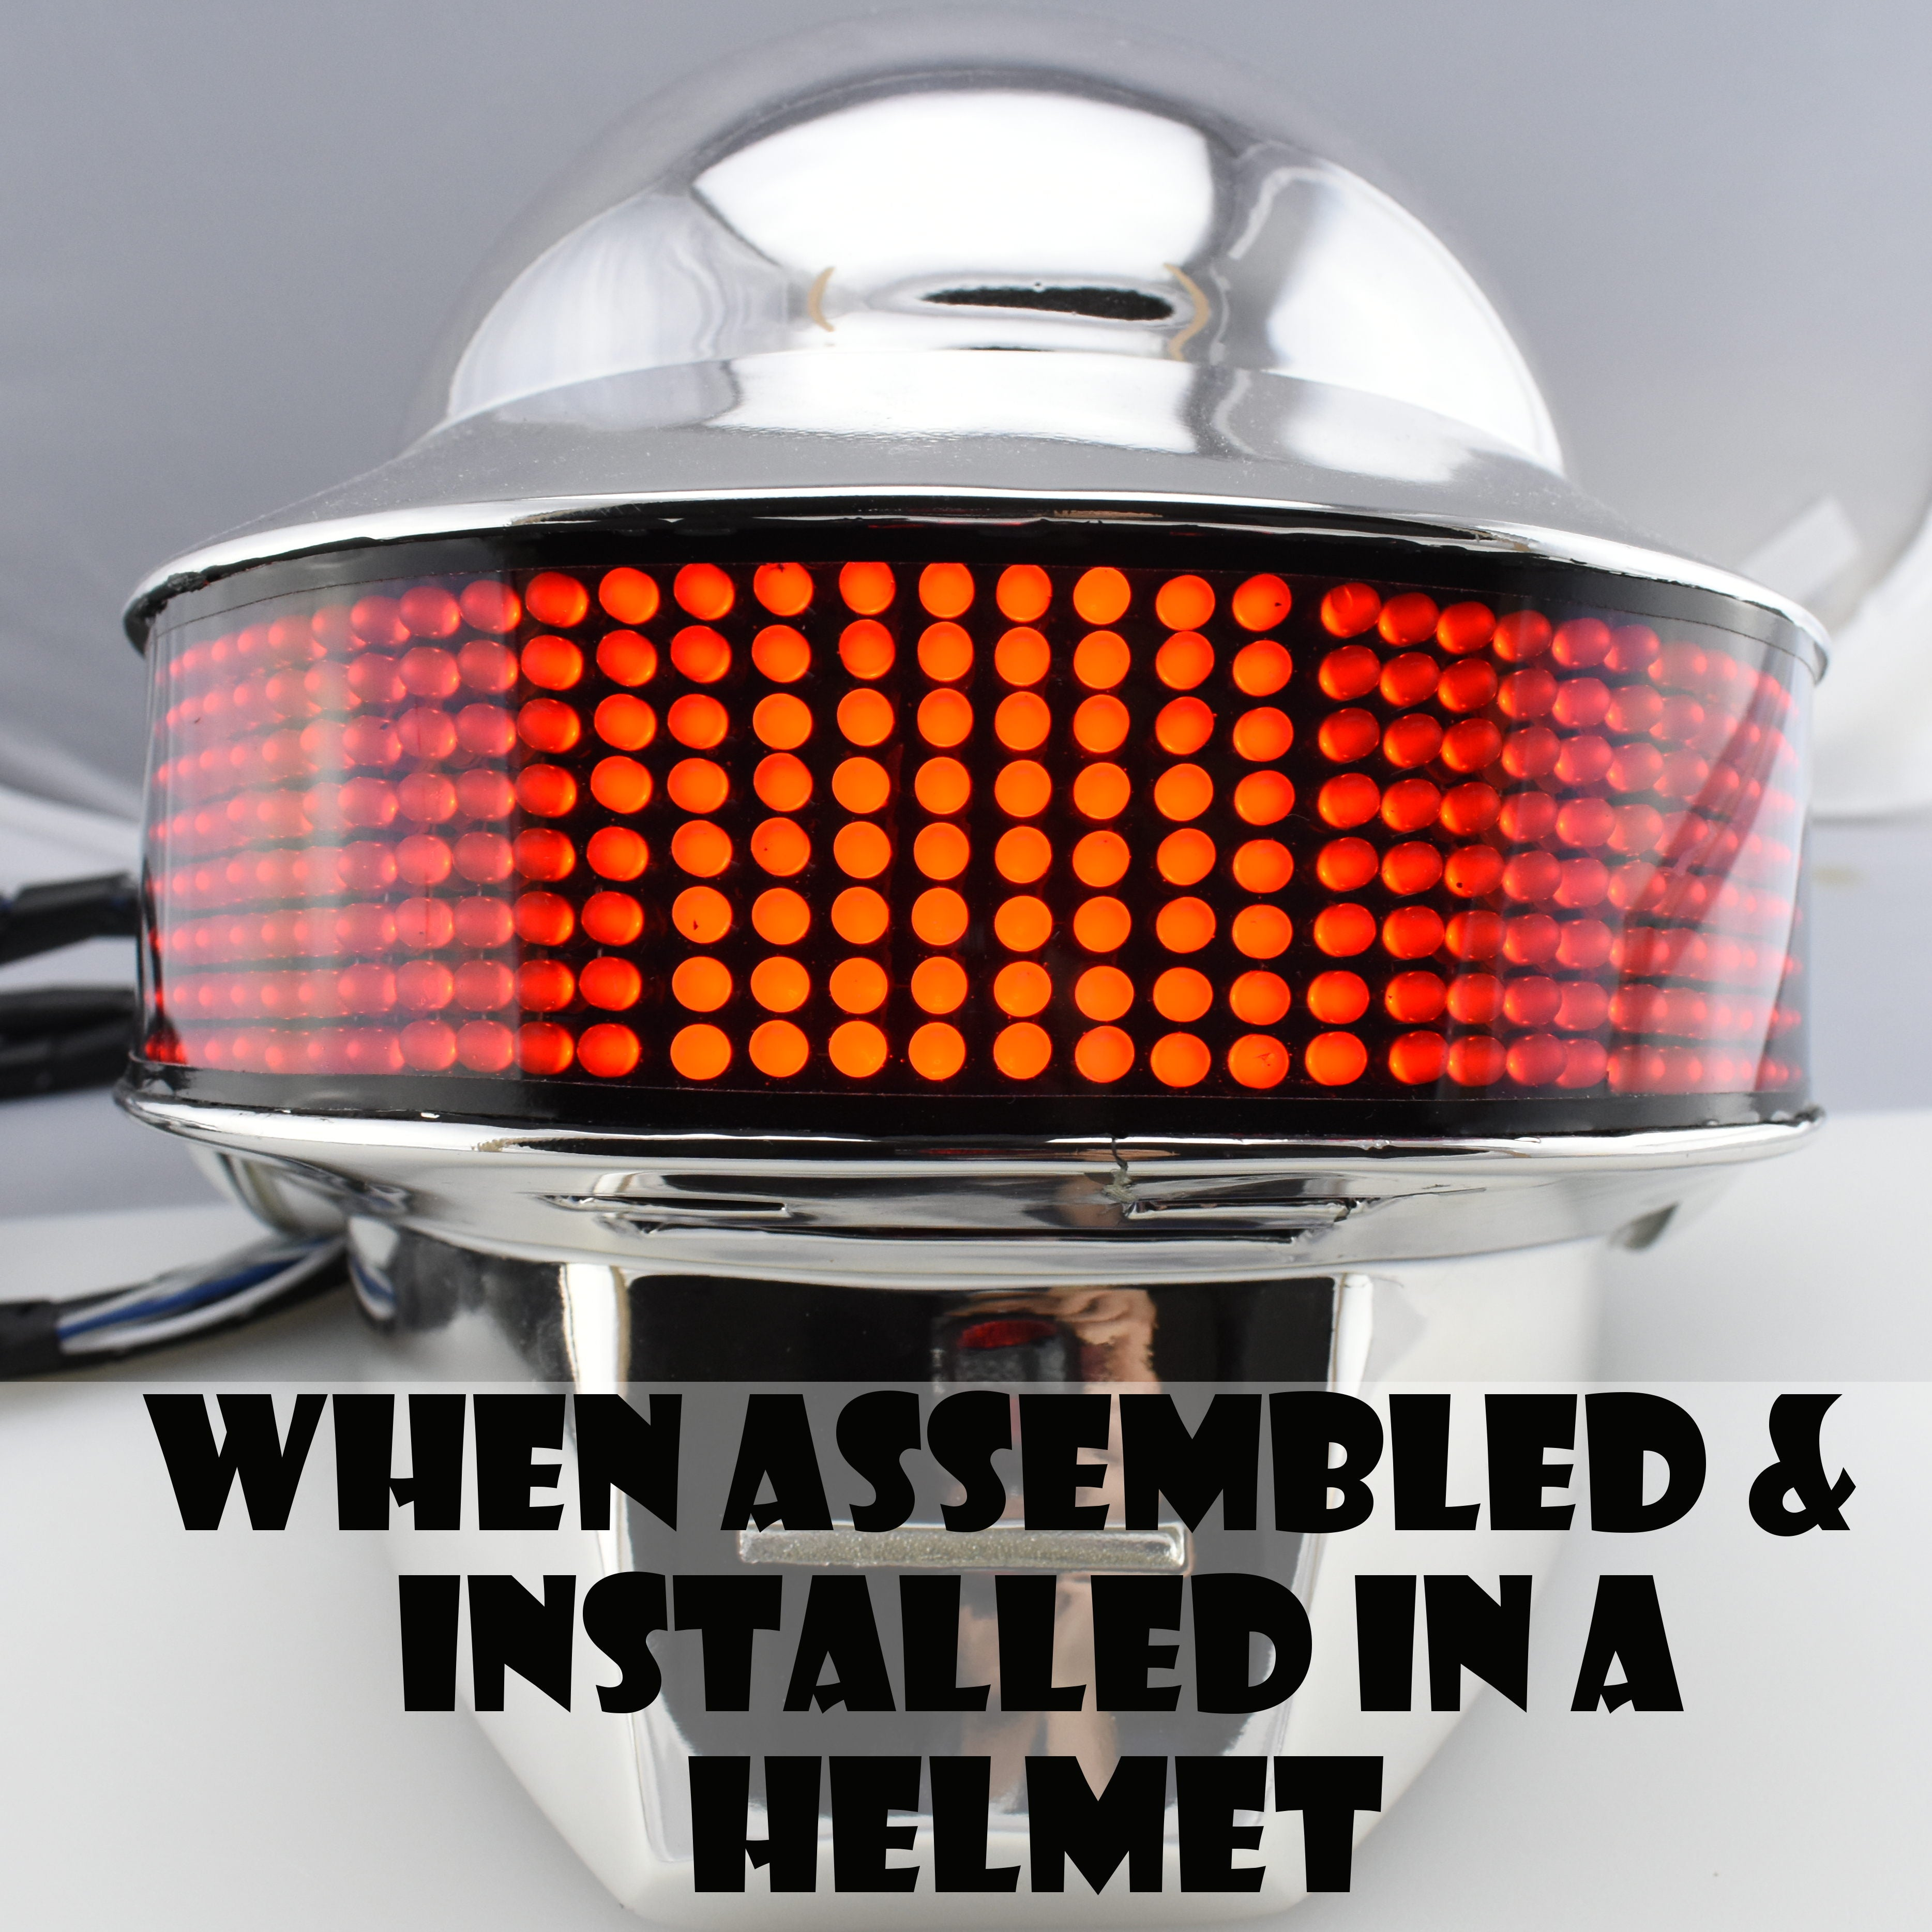 Led goggles diy kit alexplusleds image of standard bluetooth thomas diy led kit v2 solutioingenieria Gallery